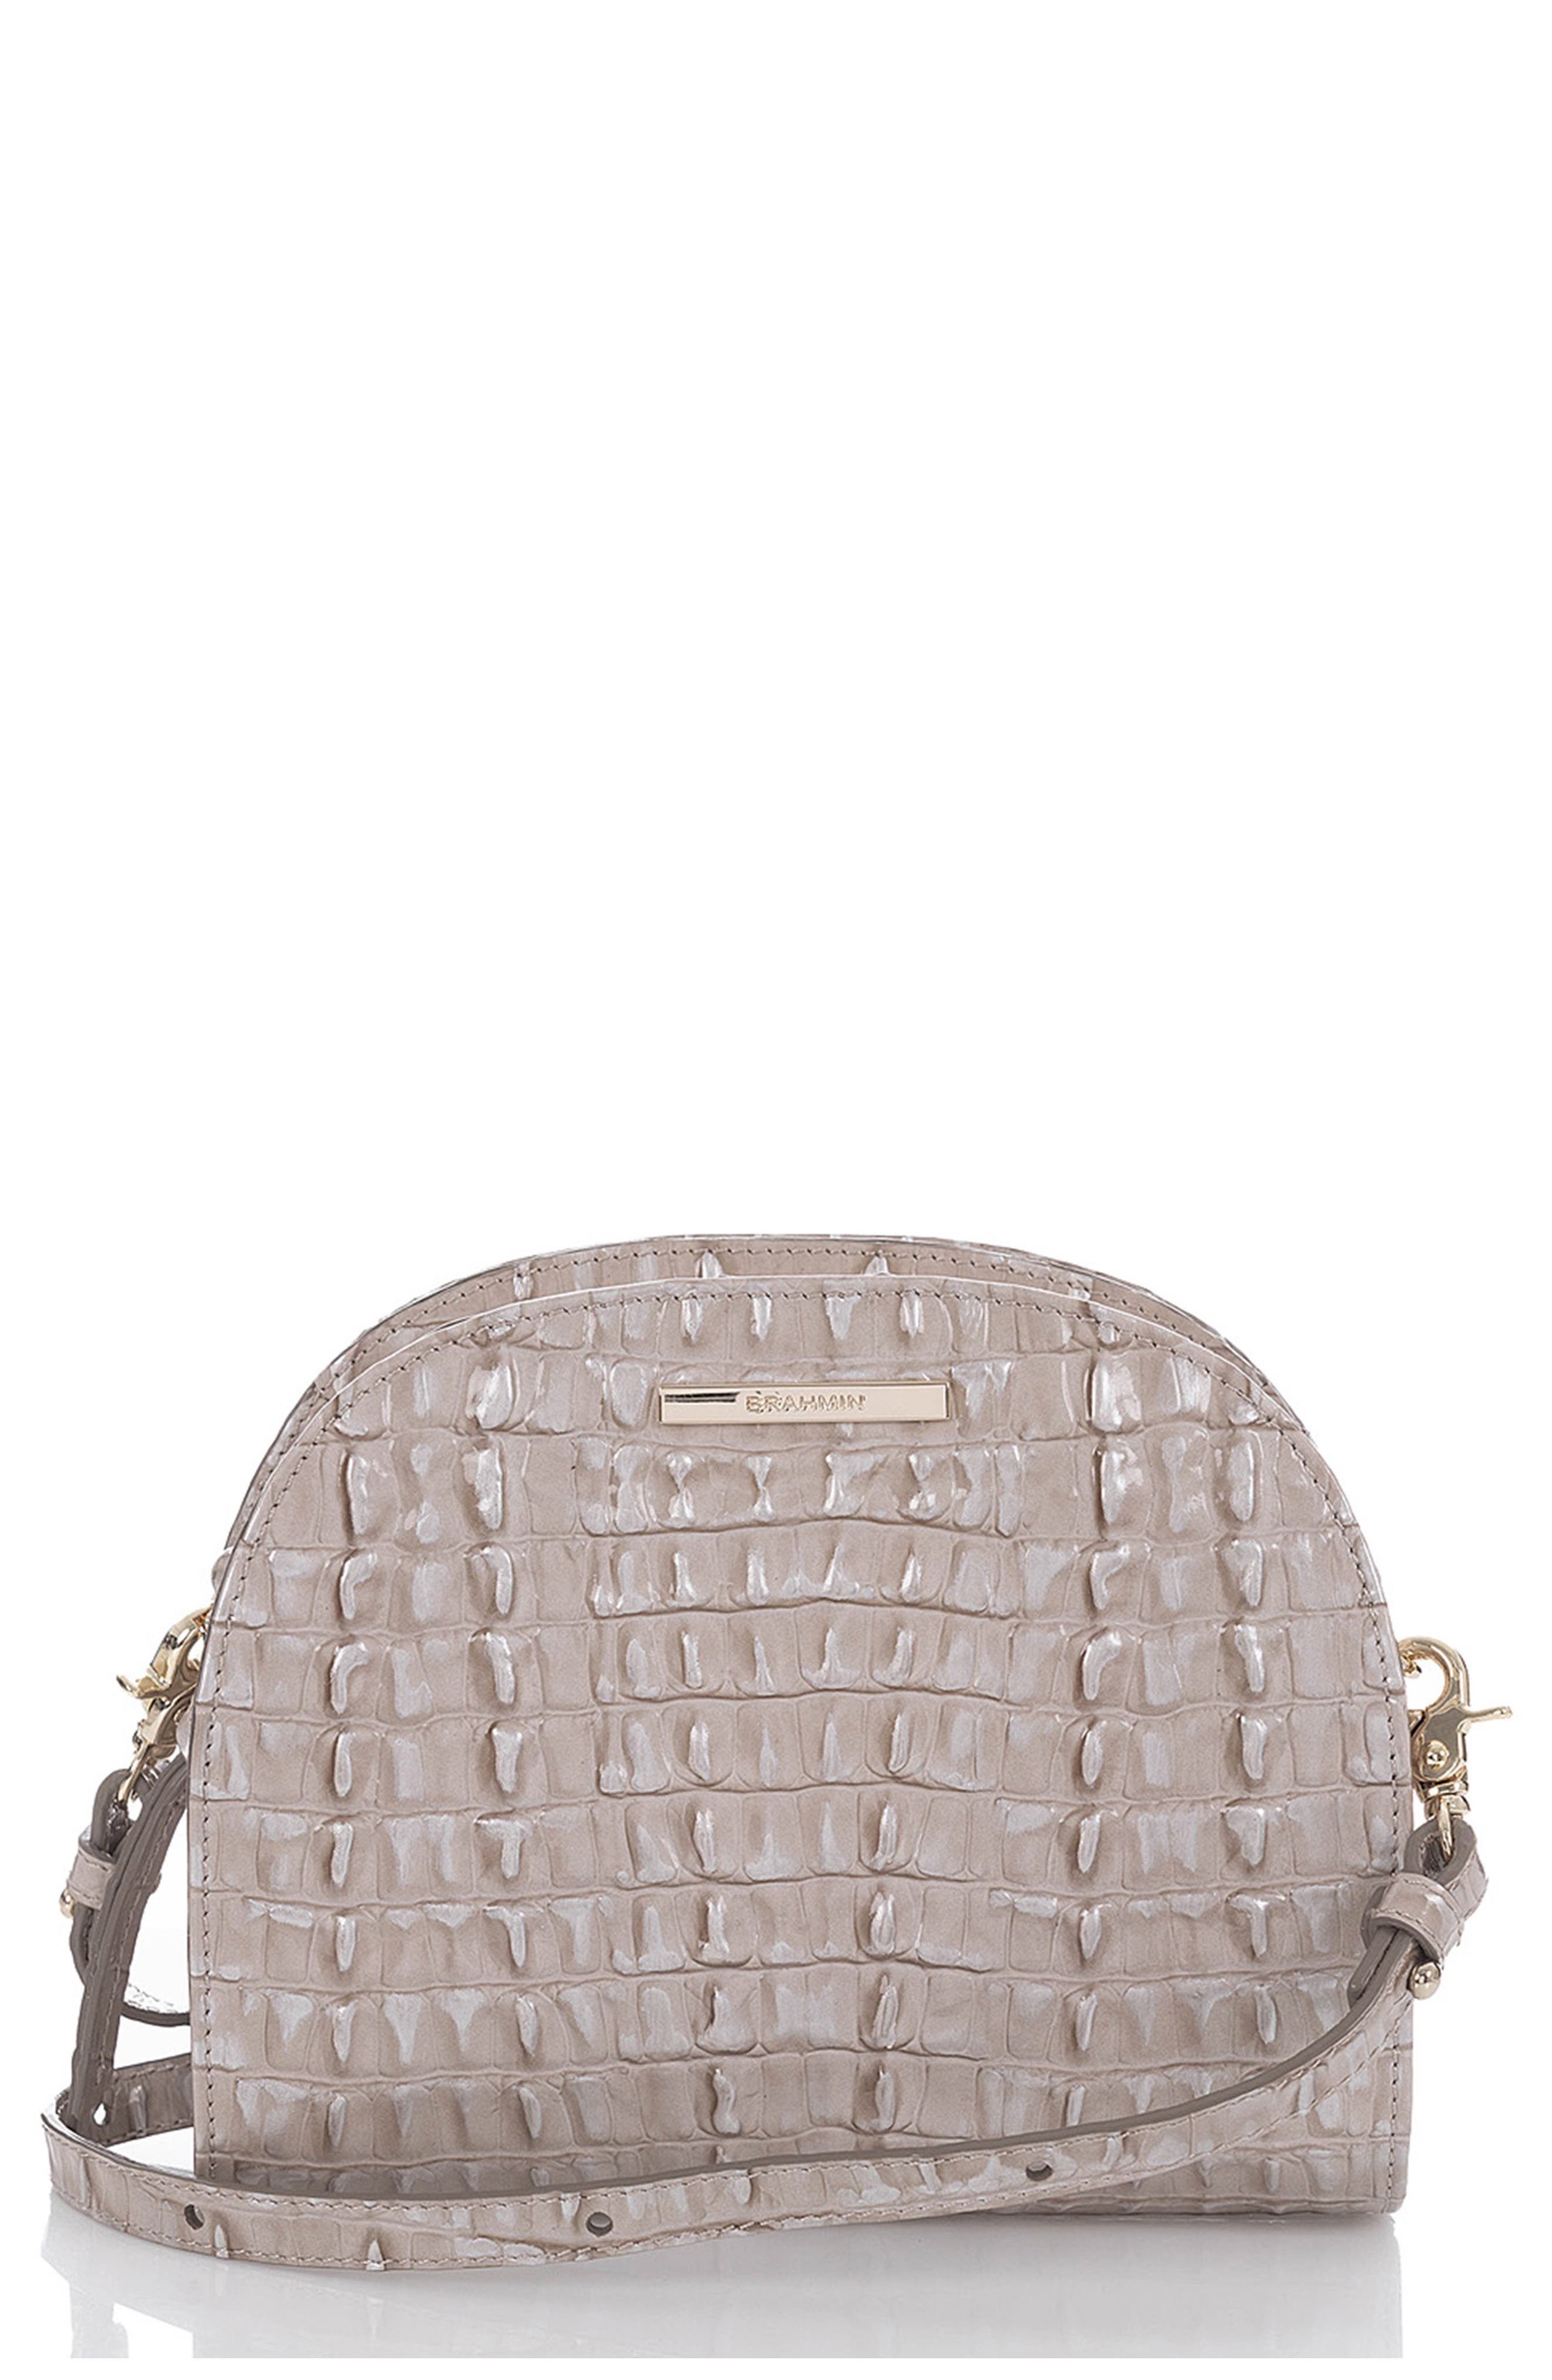 BRAHMIN Leah Croc Embossed Leather Crossbody Bag, Main, color, 020